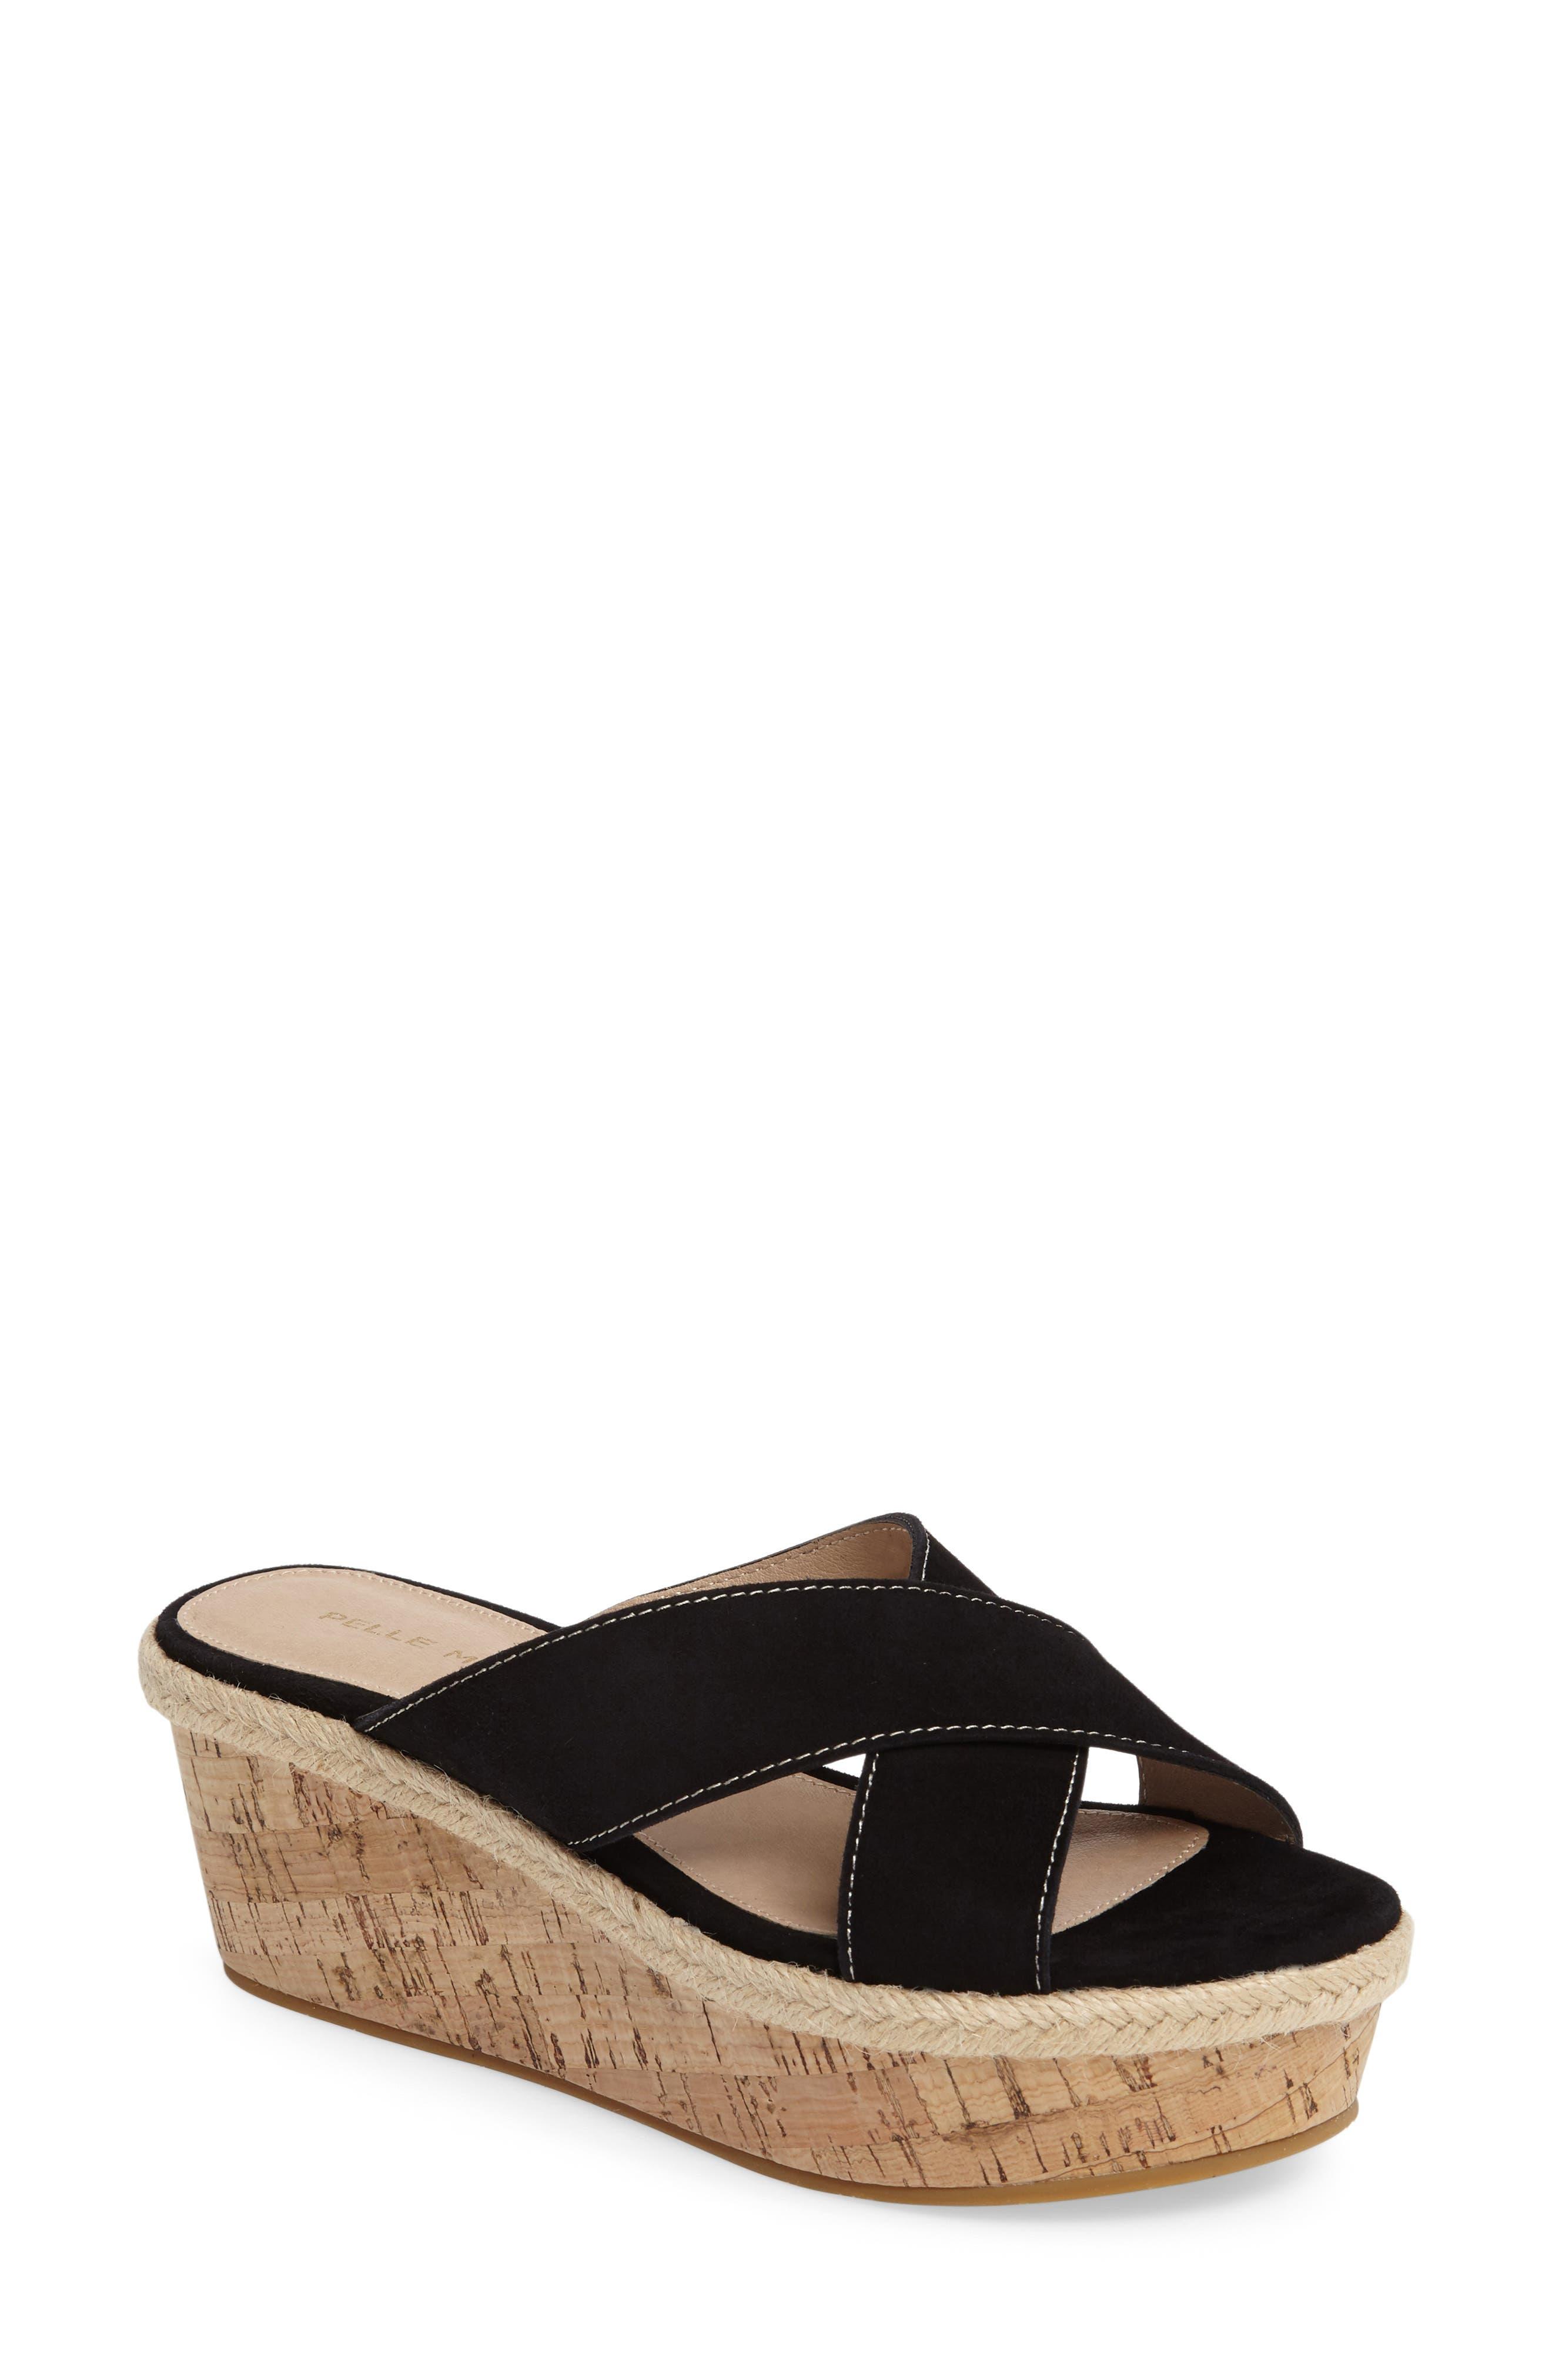 Pelle Moda Harriet Platform Wedge Sandal (Women)